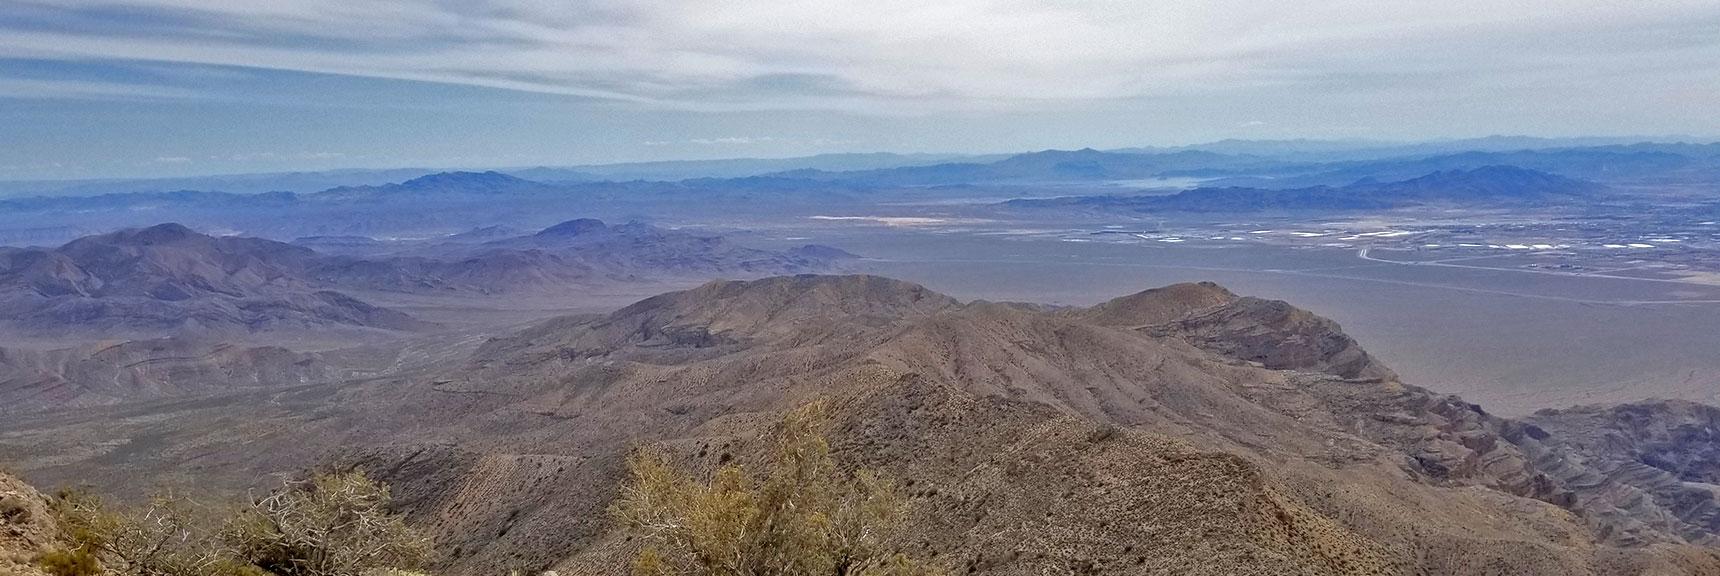 View of Lake Mead and East of Las Vegas from Near Gass Peak Eastern Summit | Gass Peak Eastern Summit Ultra-marathon Adventure, Nevada